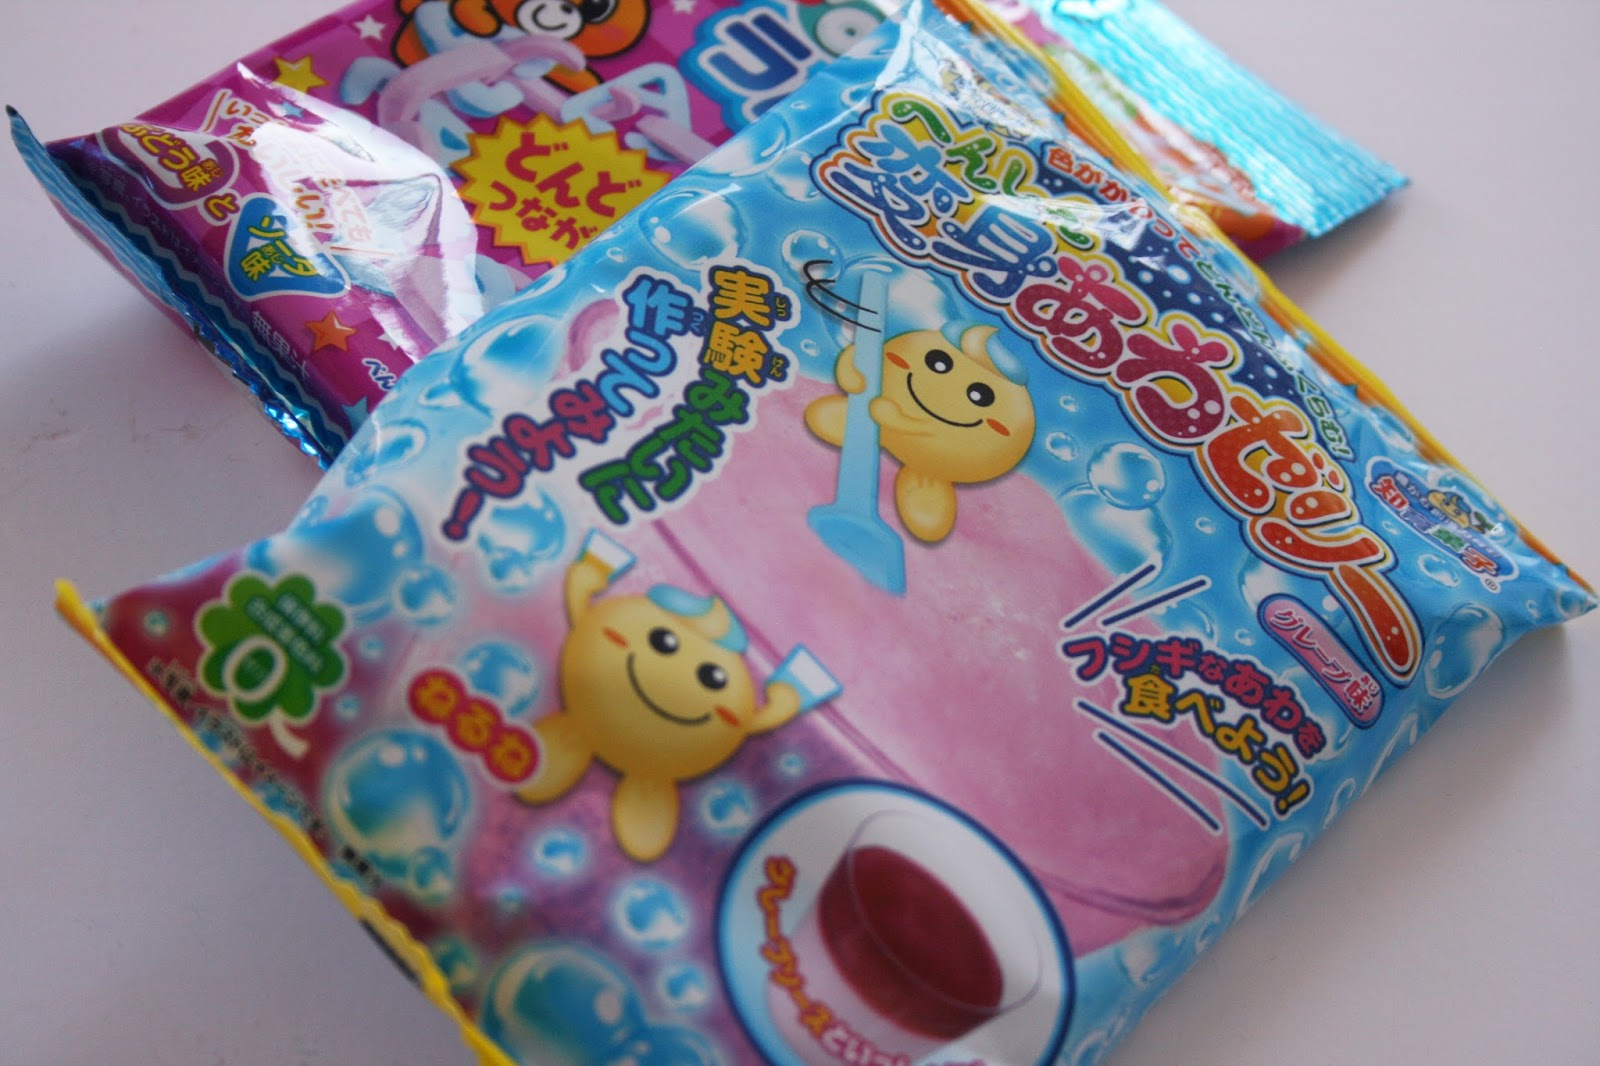 Kracie-Neru-Neru-Nerune-DIY-Candy